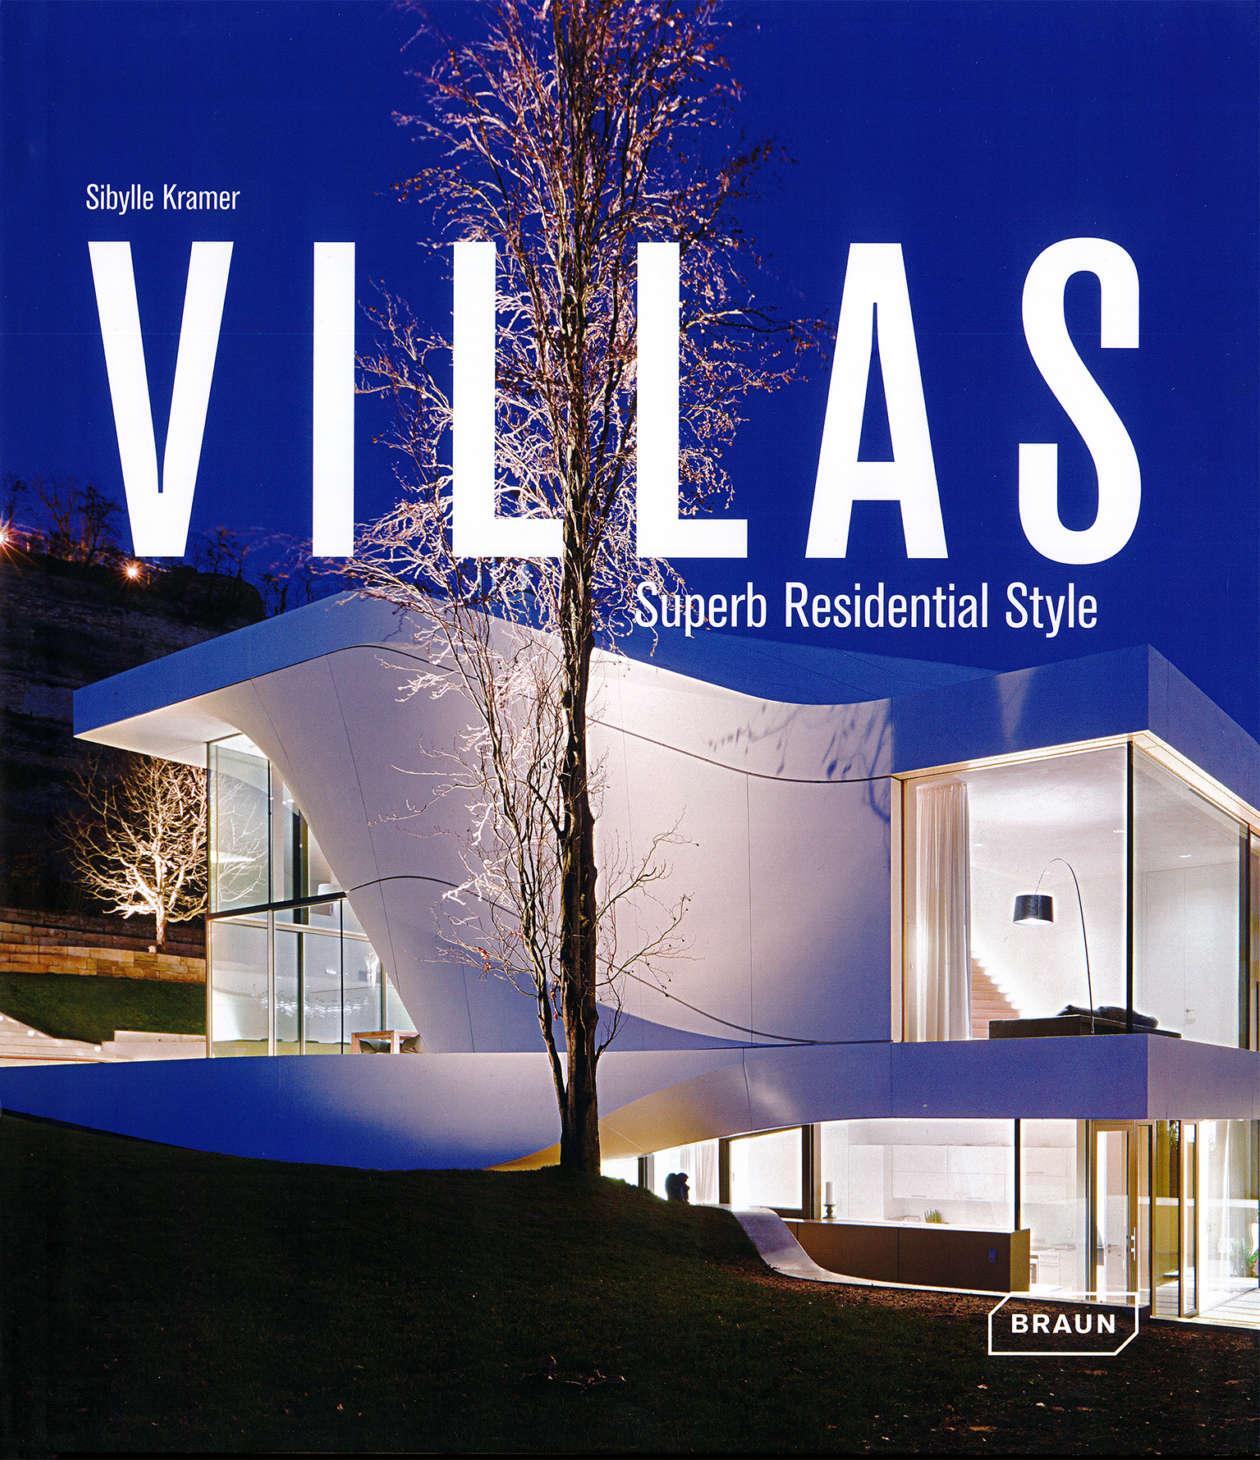 Villas Superb Residential Style 01